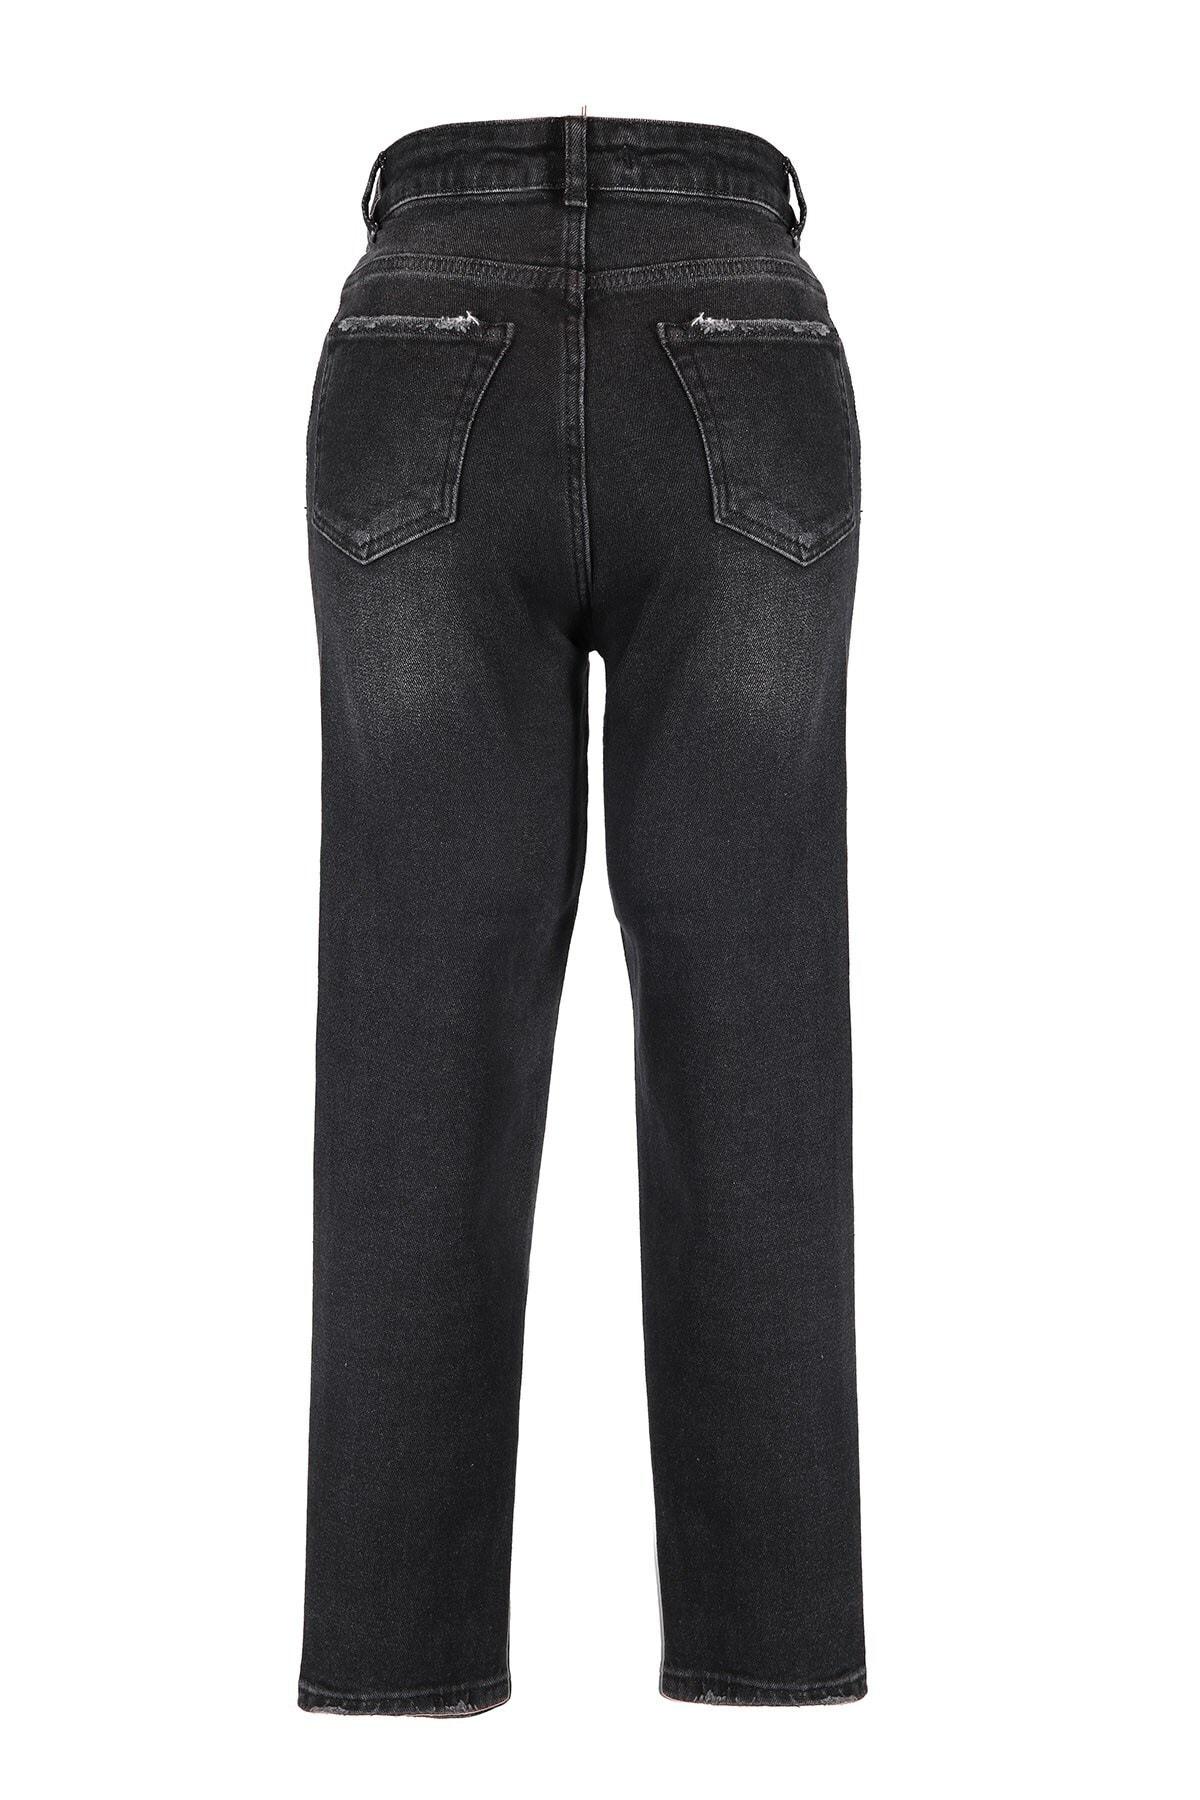 Oblavion Kadın Siyah Mom Jeans 2